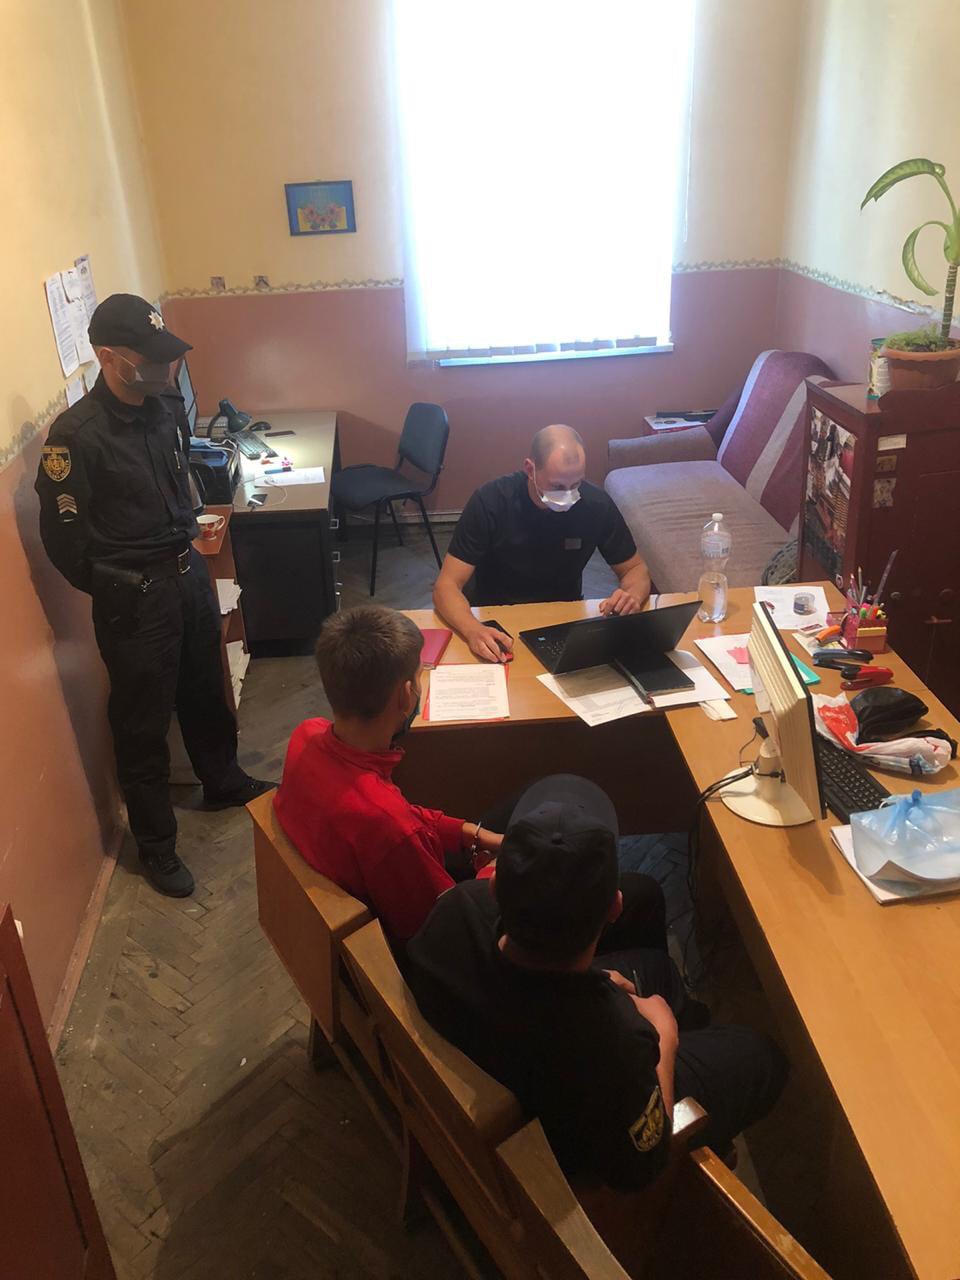 Во Львове парни жестоко избили двух пенсионеров: один погиб, другой в коме